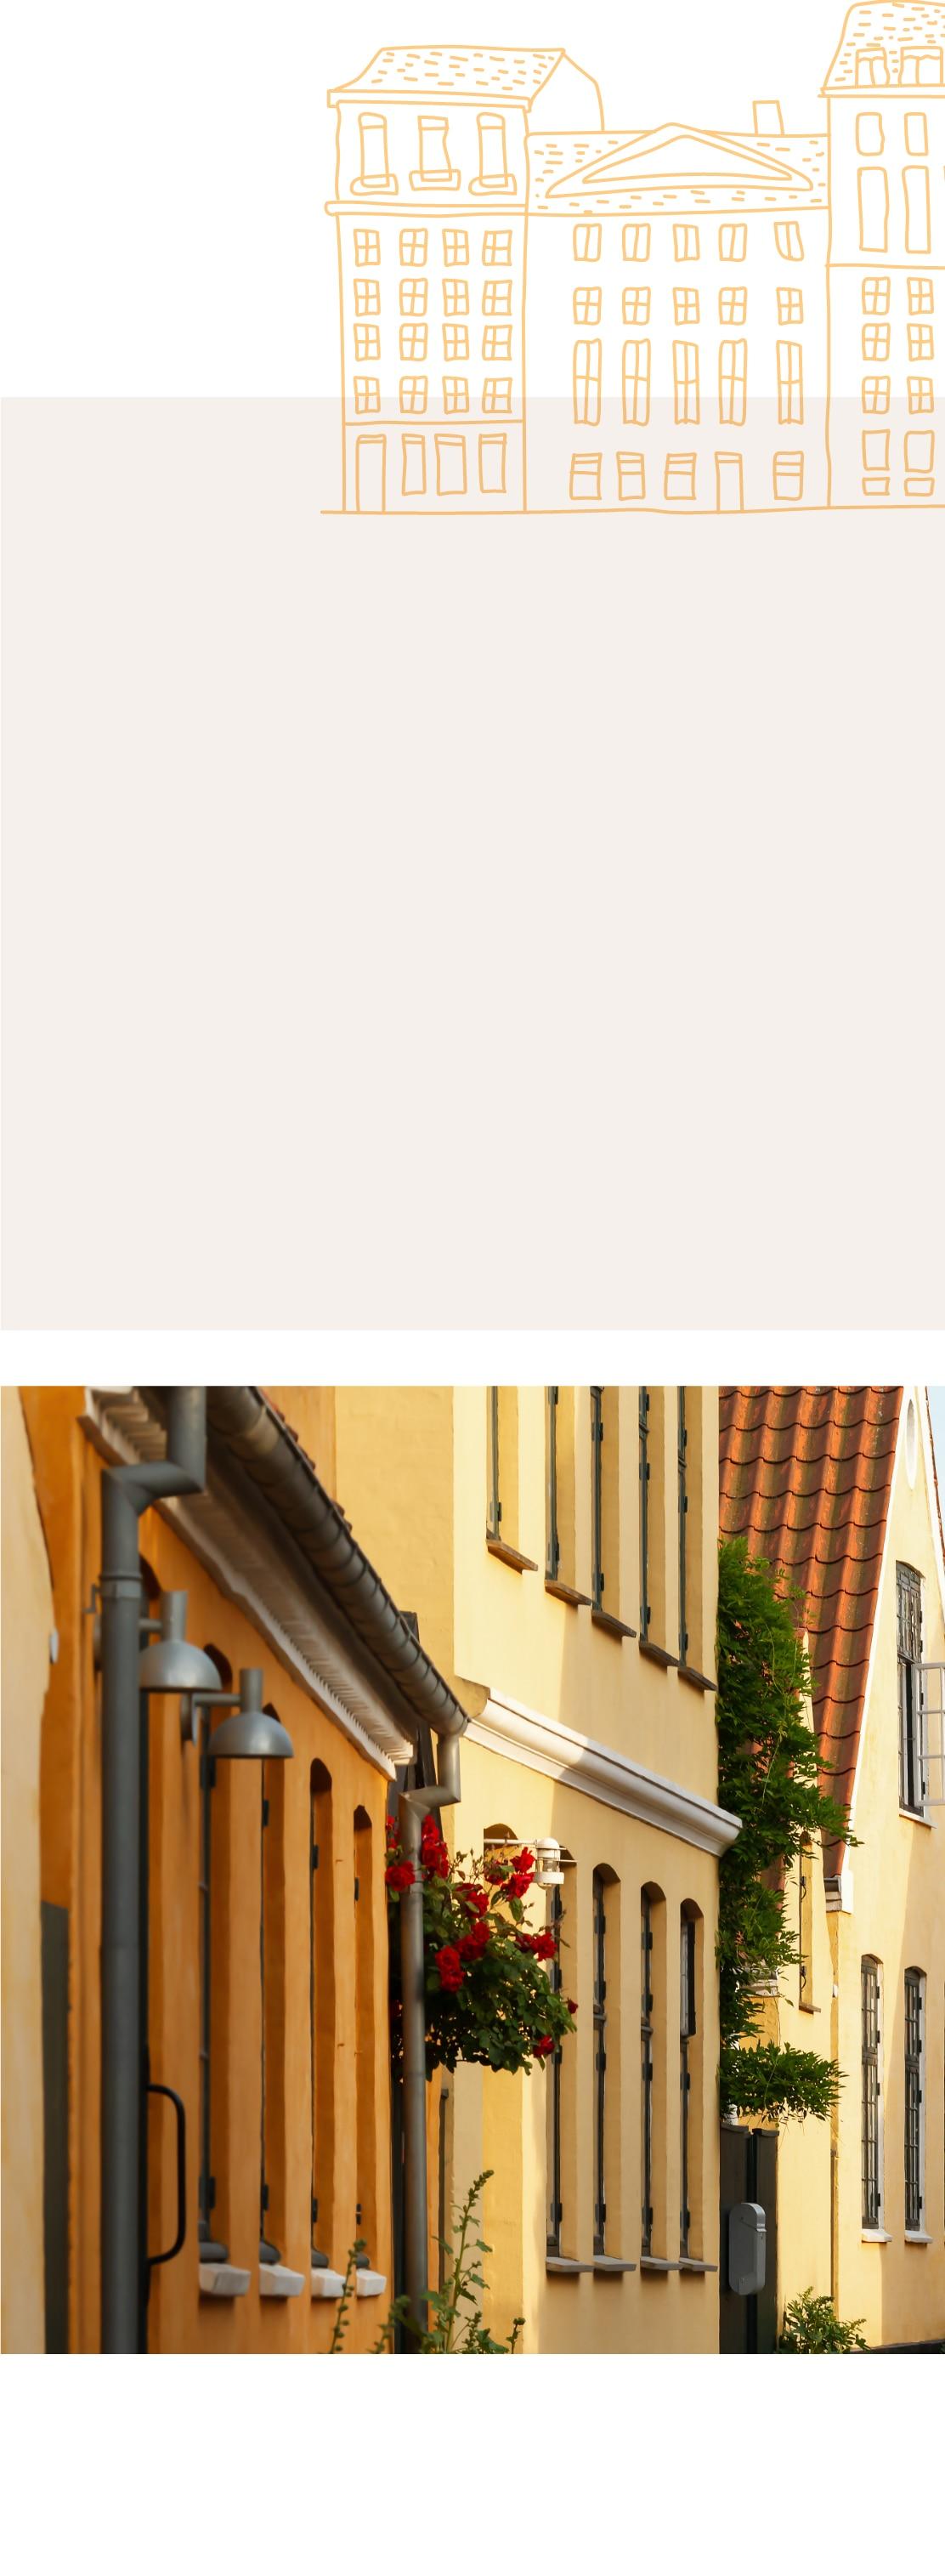 Illustration of buildings. Image of a quiet Copenhagen street.